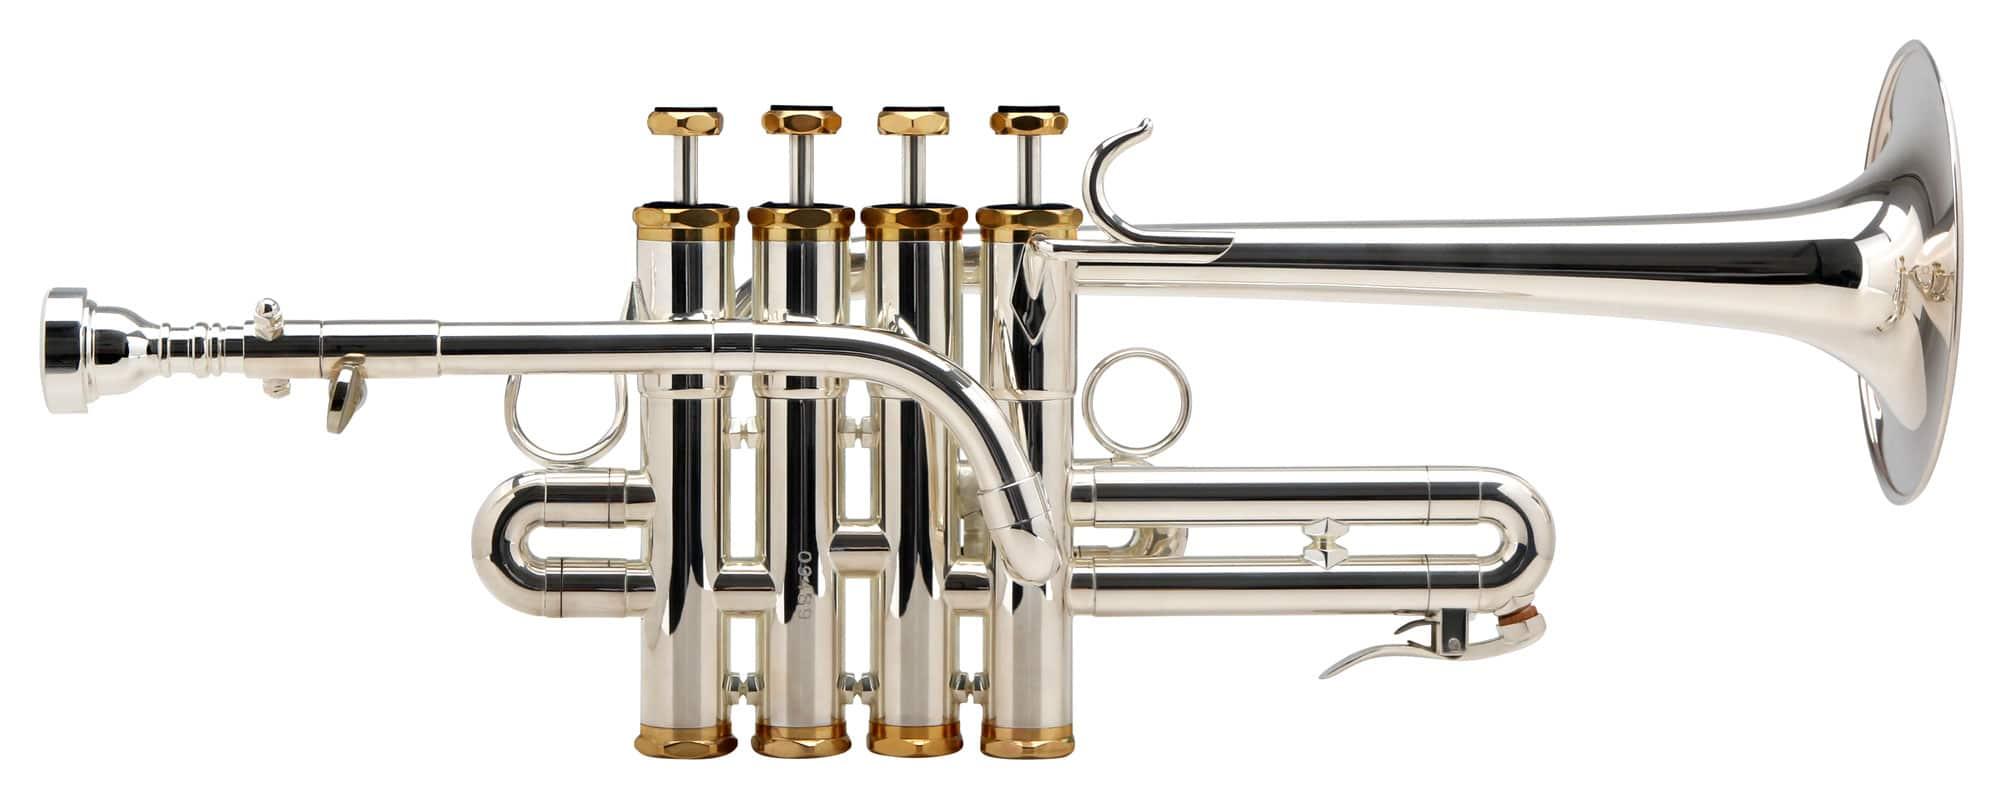 Trompeten - Lechgold PT 910S Piccolo Trompete - Onlineshop Musikhaus Kirstein